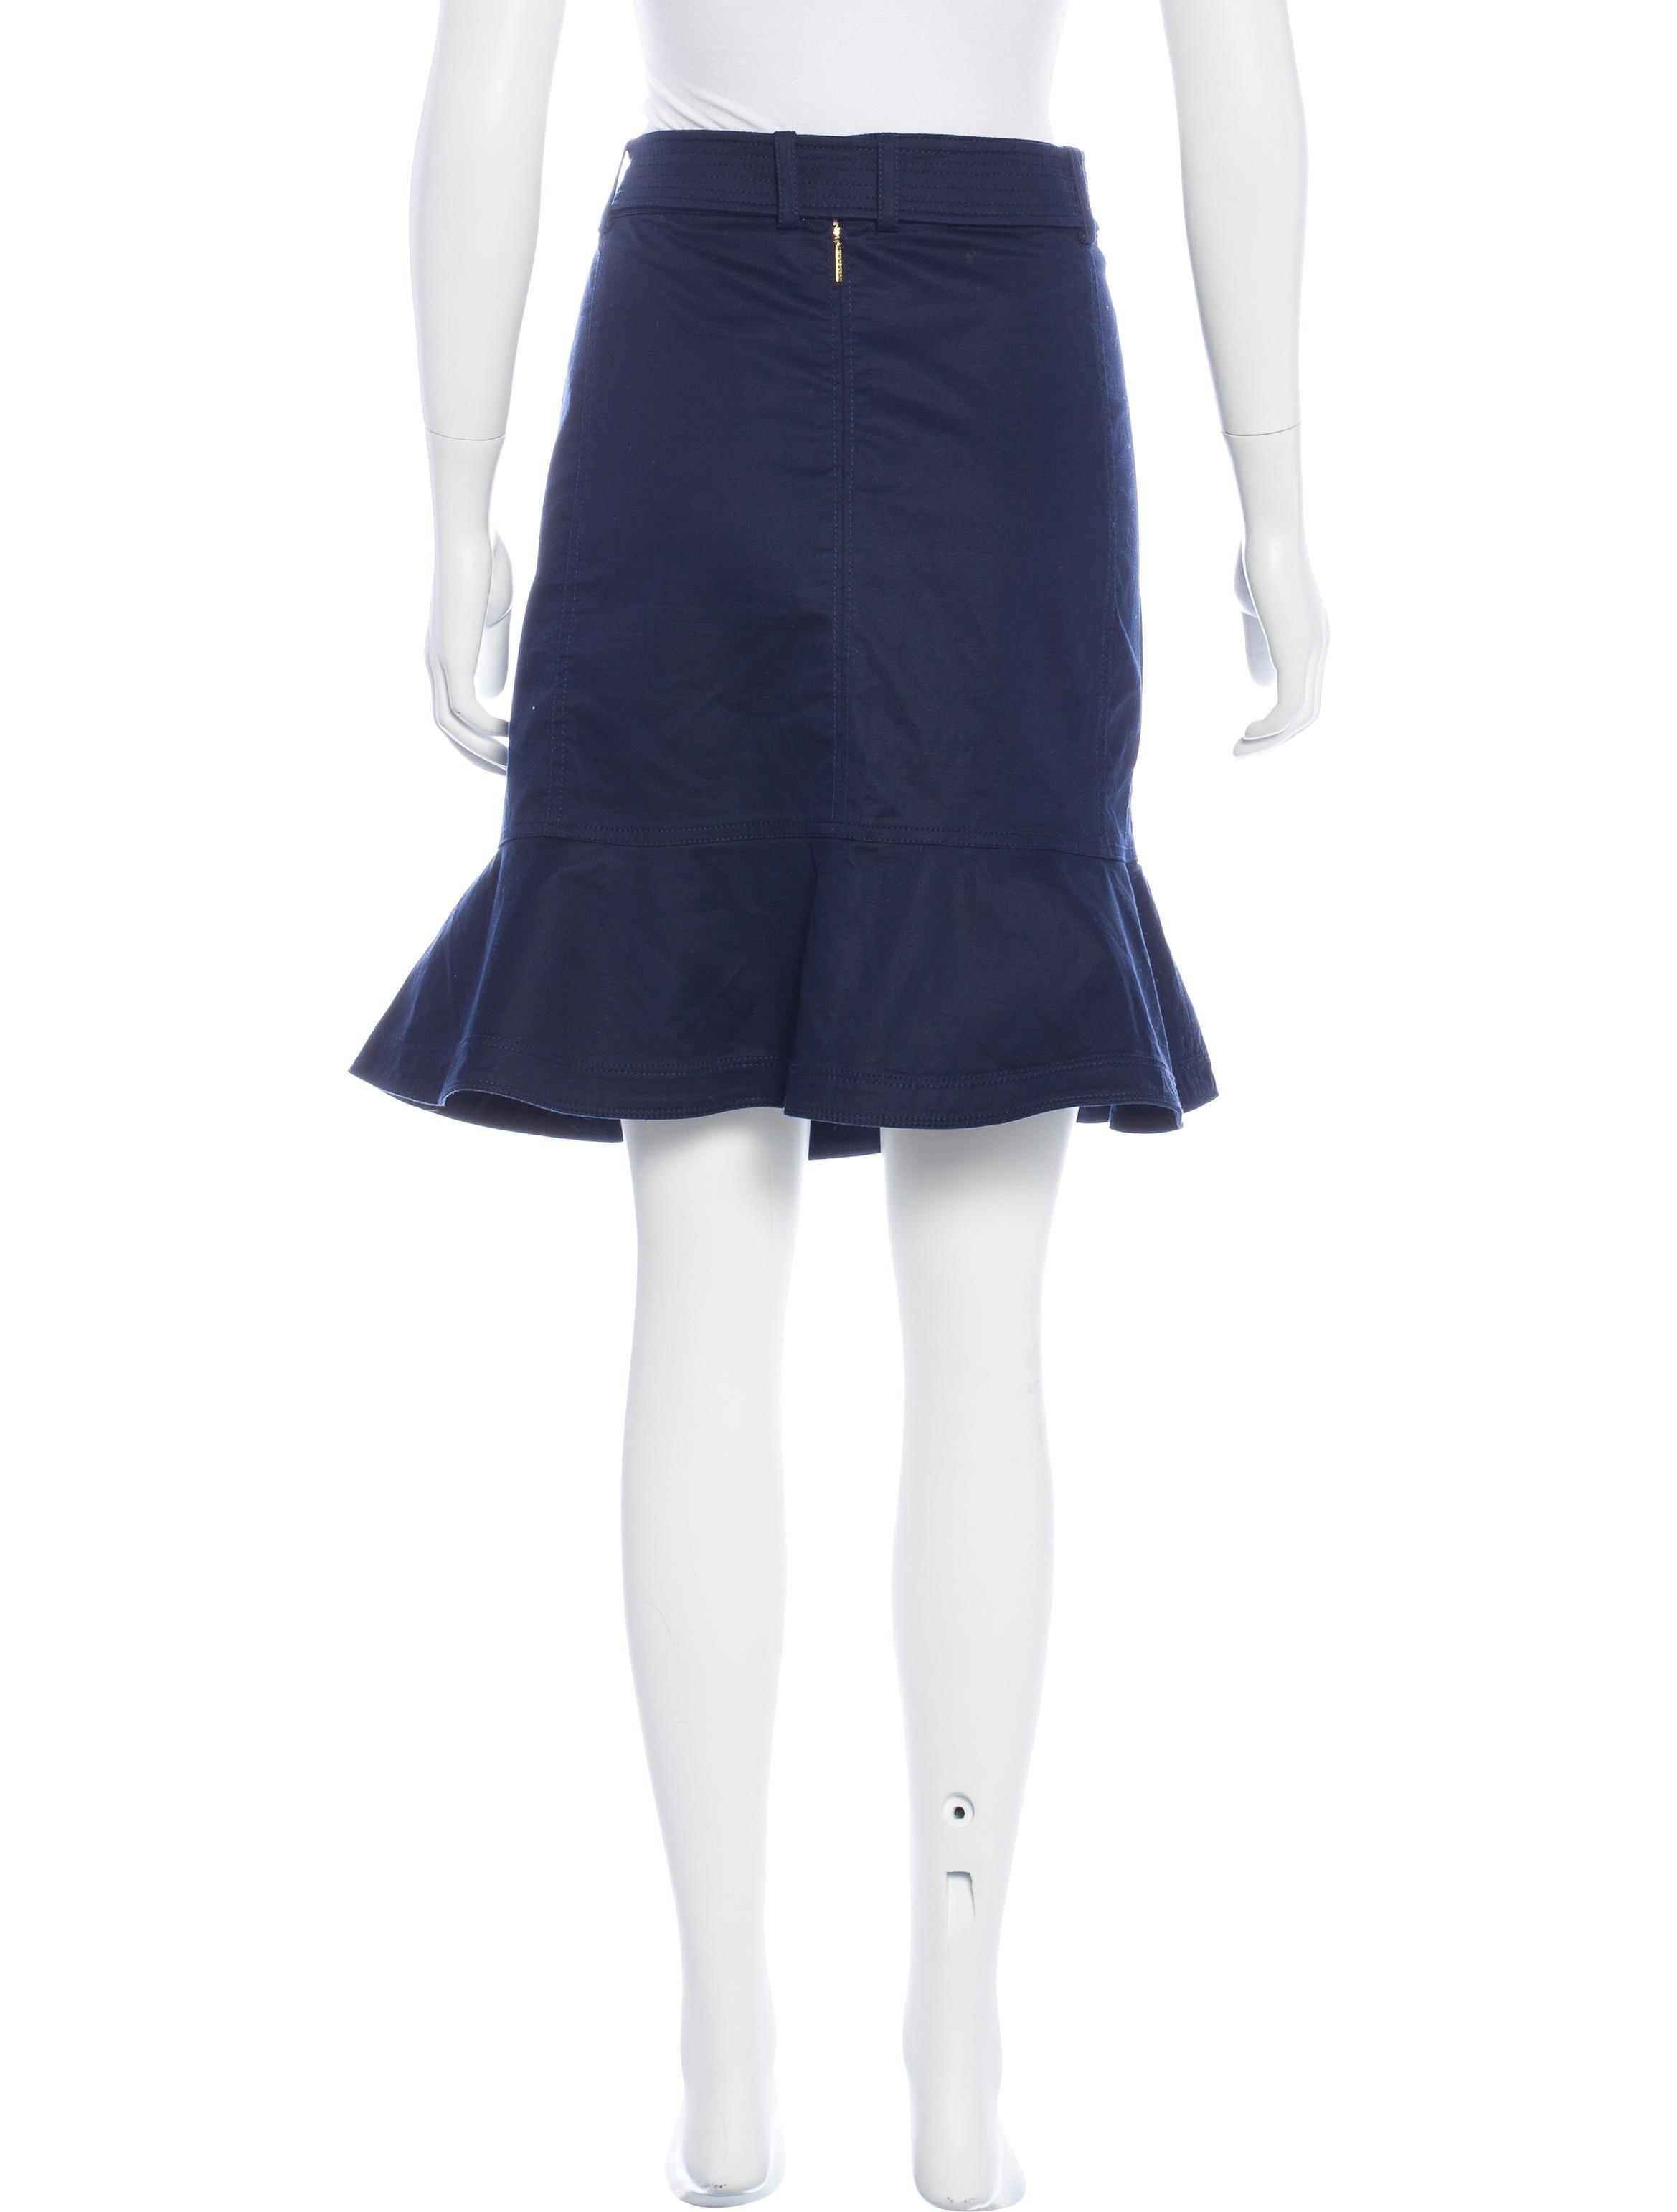 burch knee length peplum skirt clothing wto100141